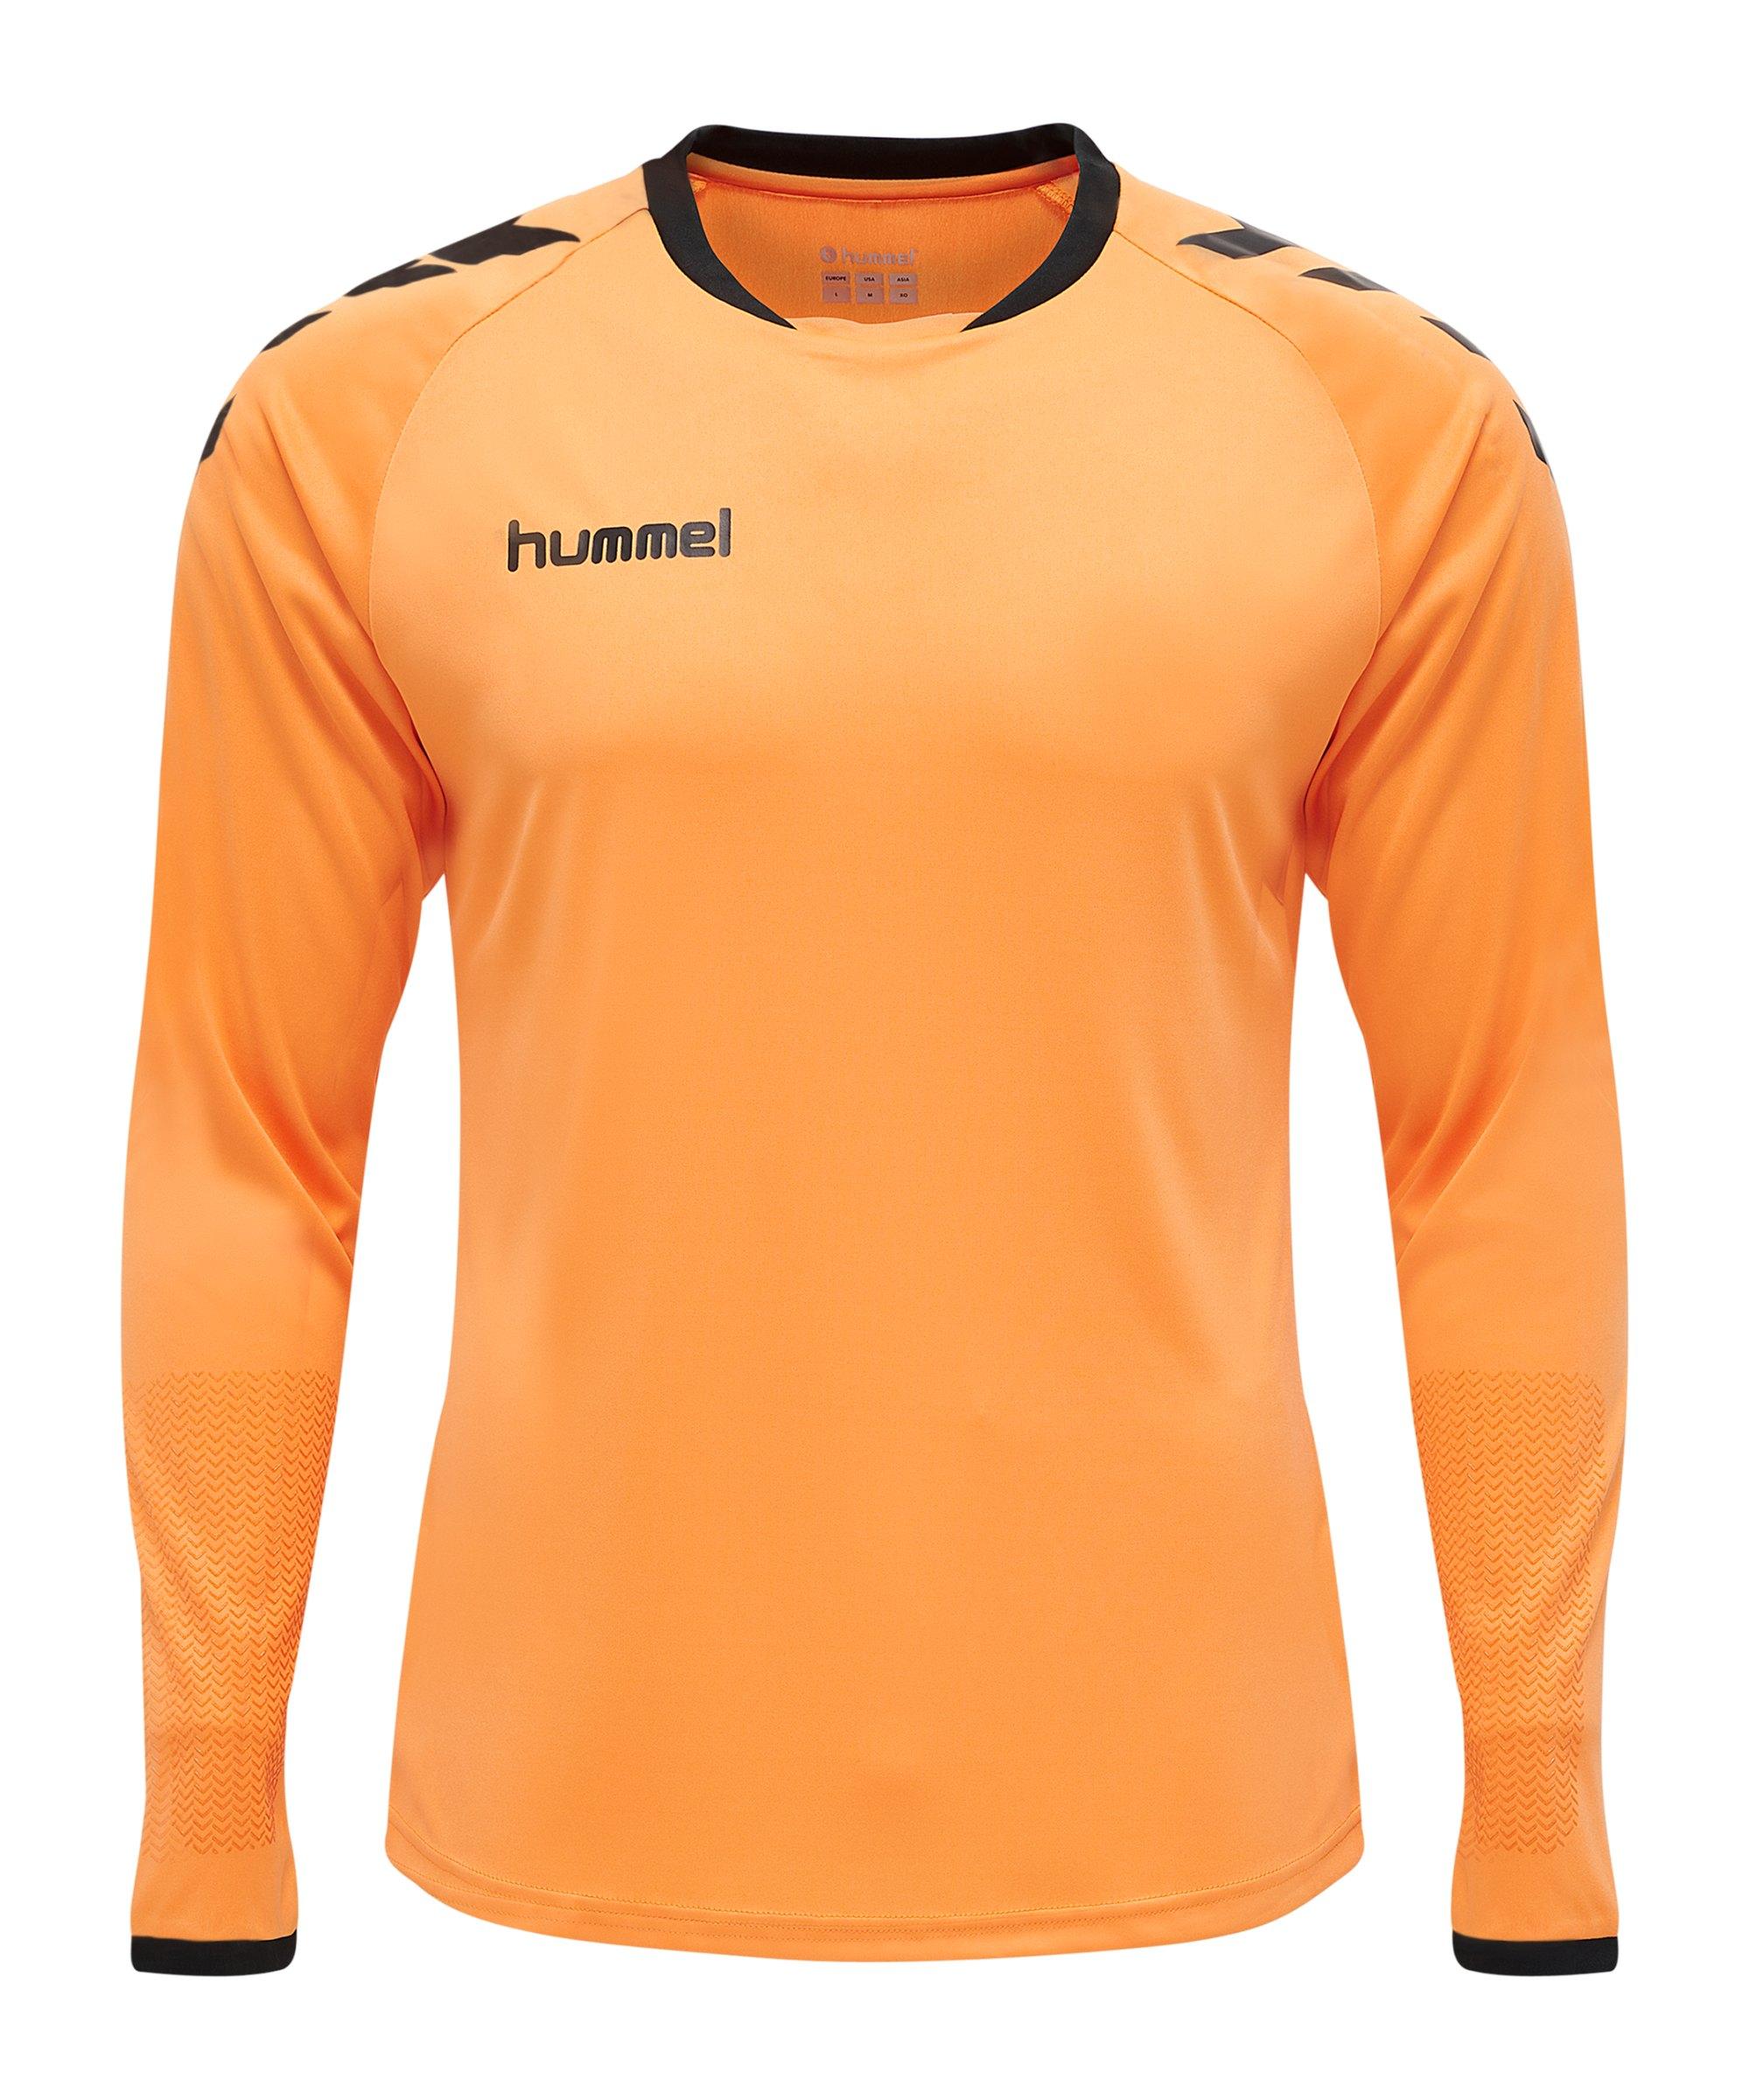 Hummel Core GK Torwarttrikotset Kids Orange F5006 - orange